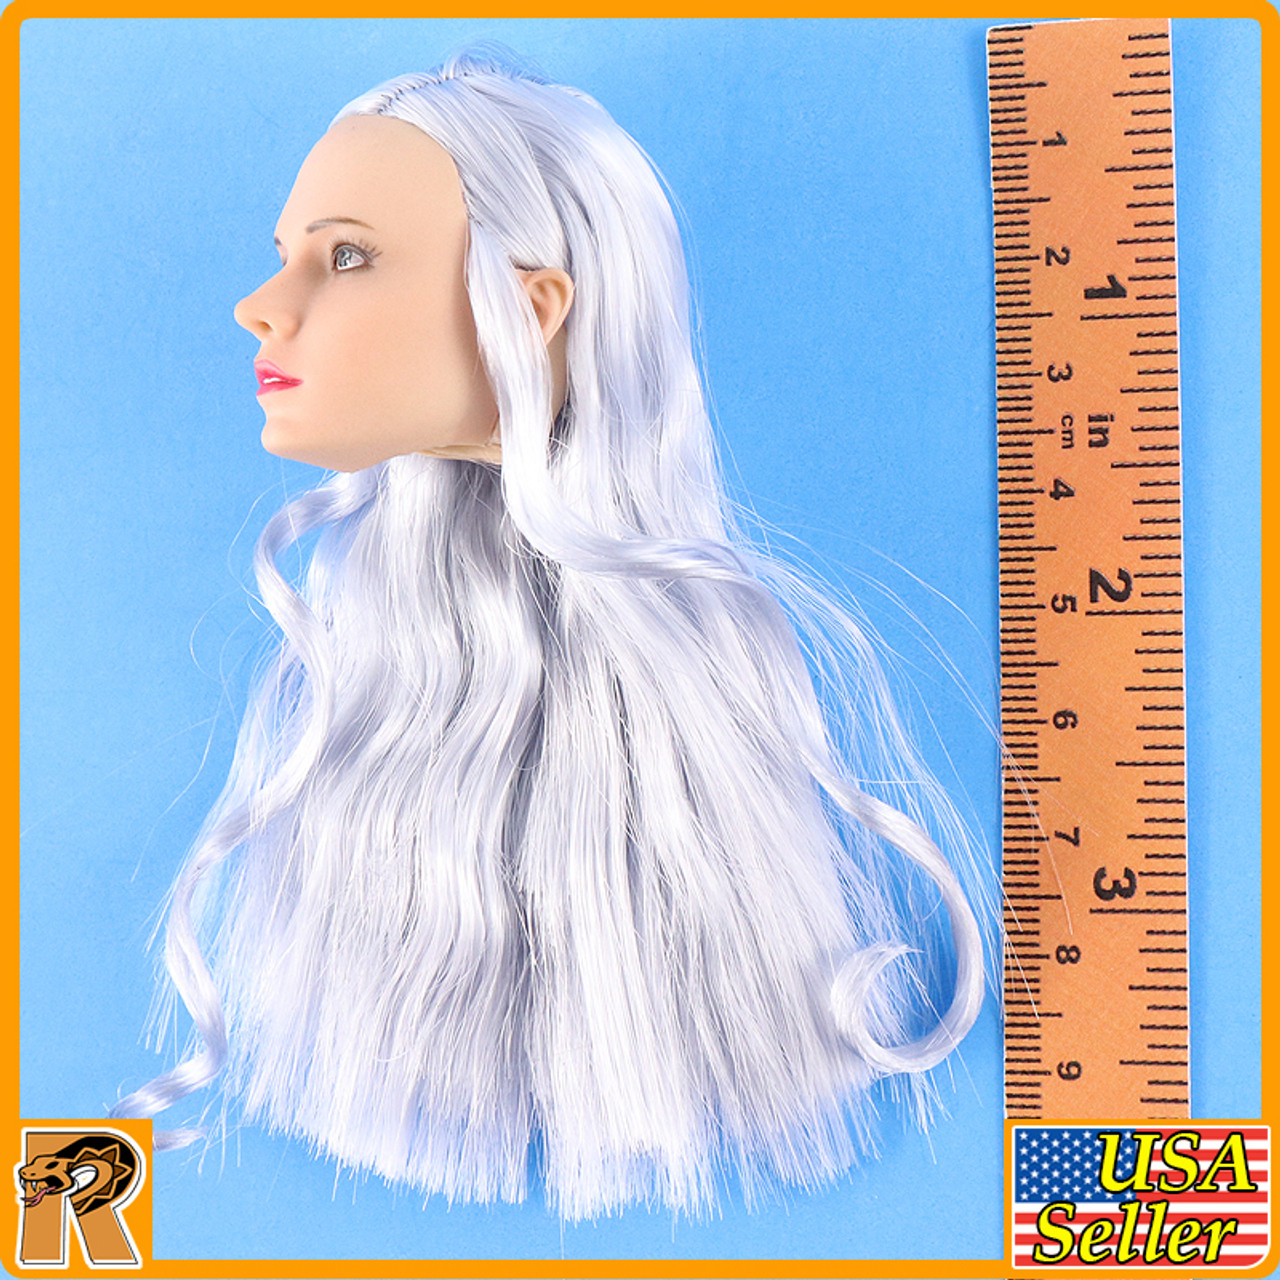 Katyusha Red Alert Soviet Female - Head w/ Silver Rooted Hair - 1/6 Scale -